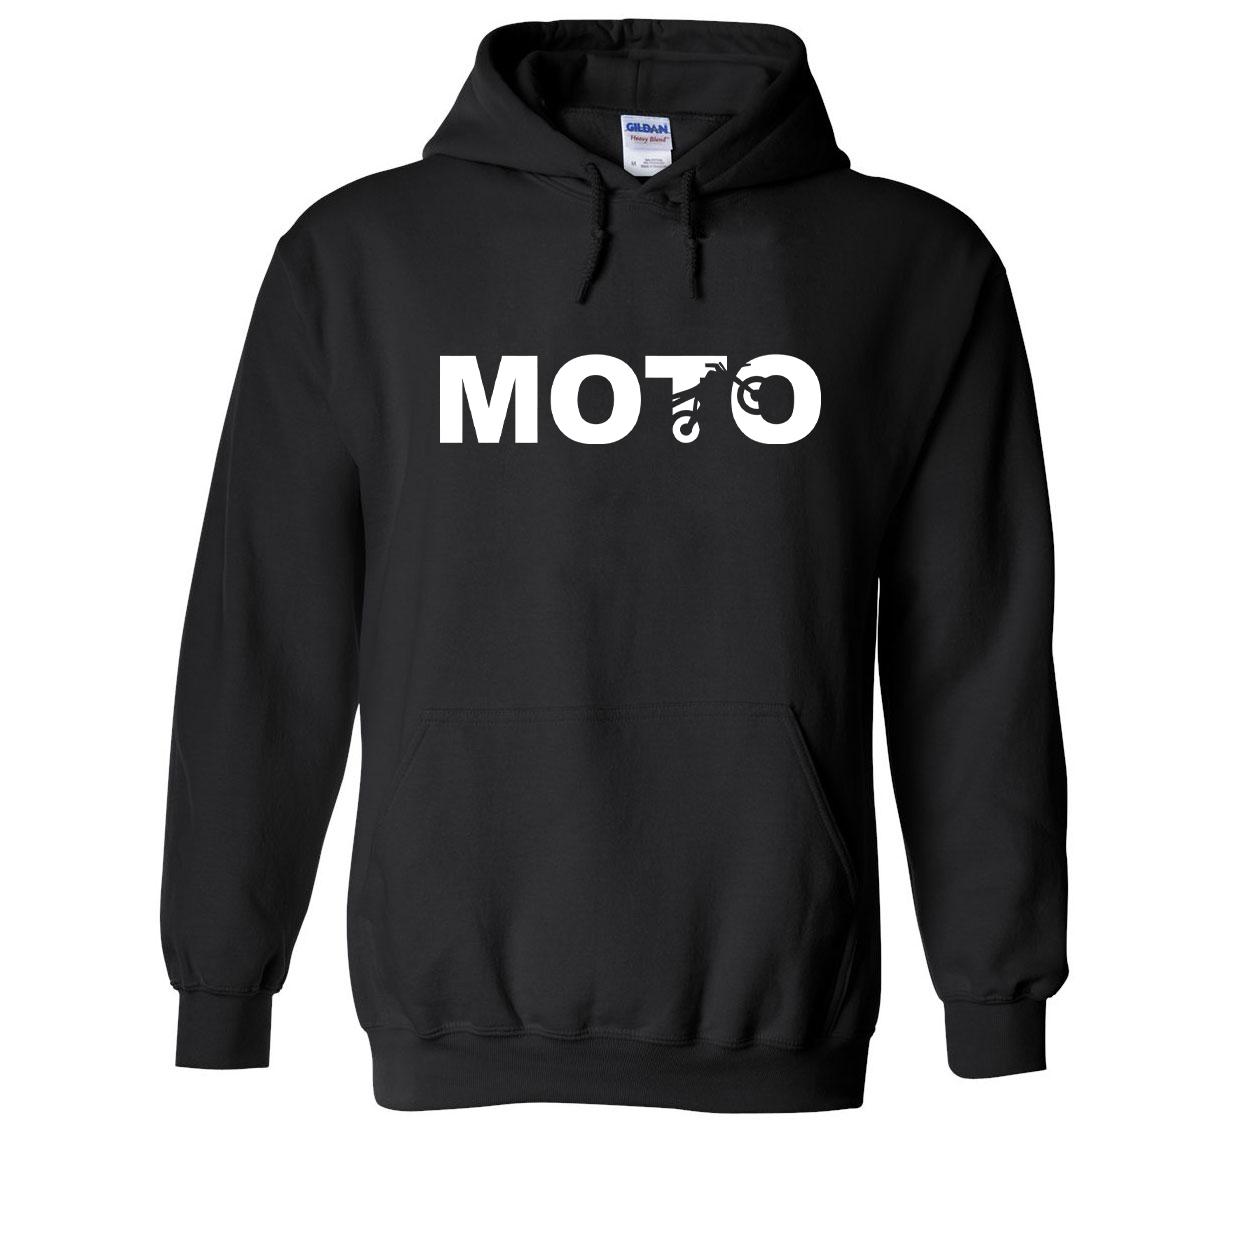 Moto Wheelie Logo Classic Sweatshirt Black (White Logo)